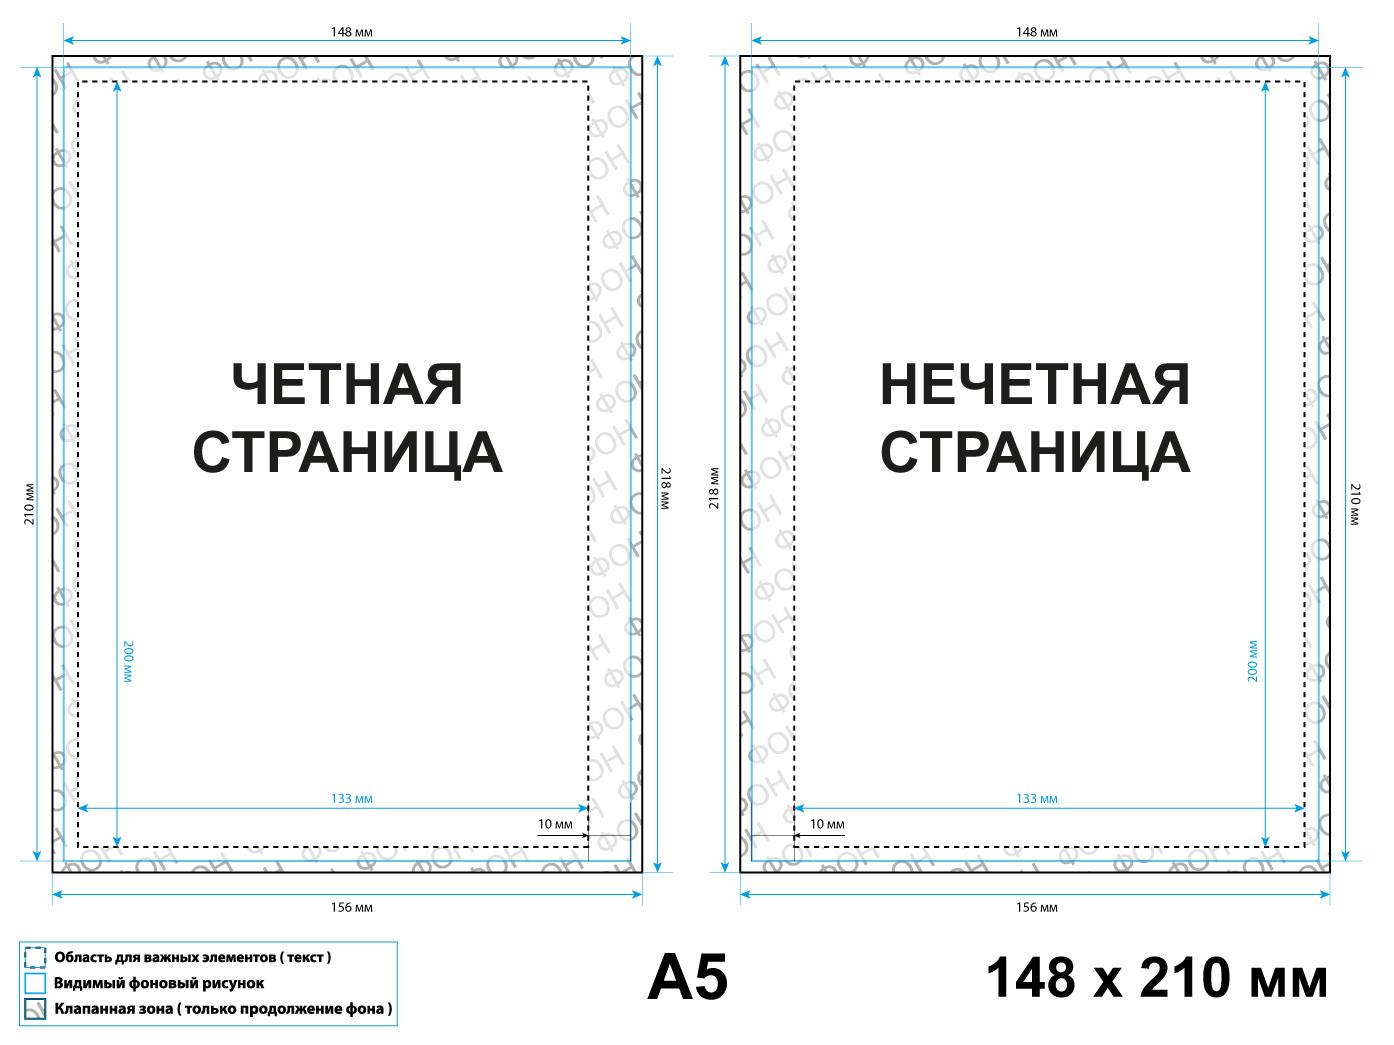 Страницы формата А5